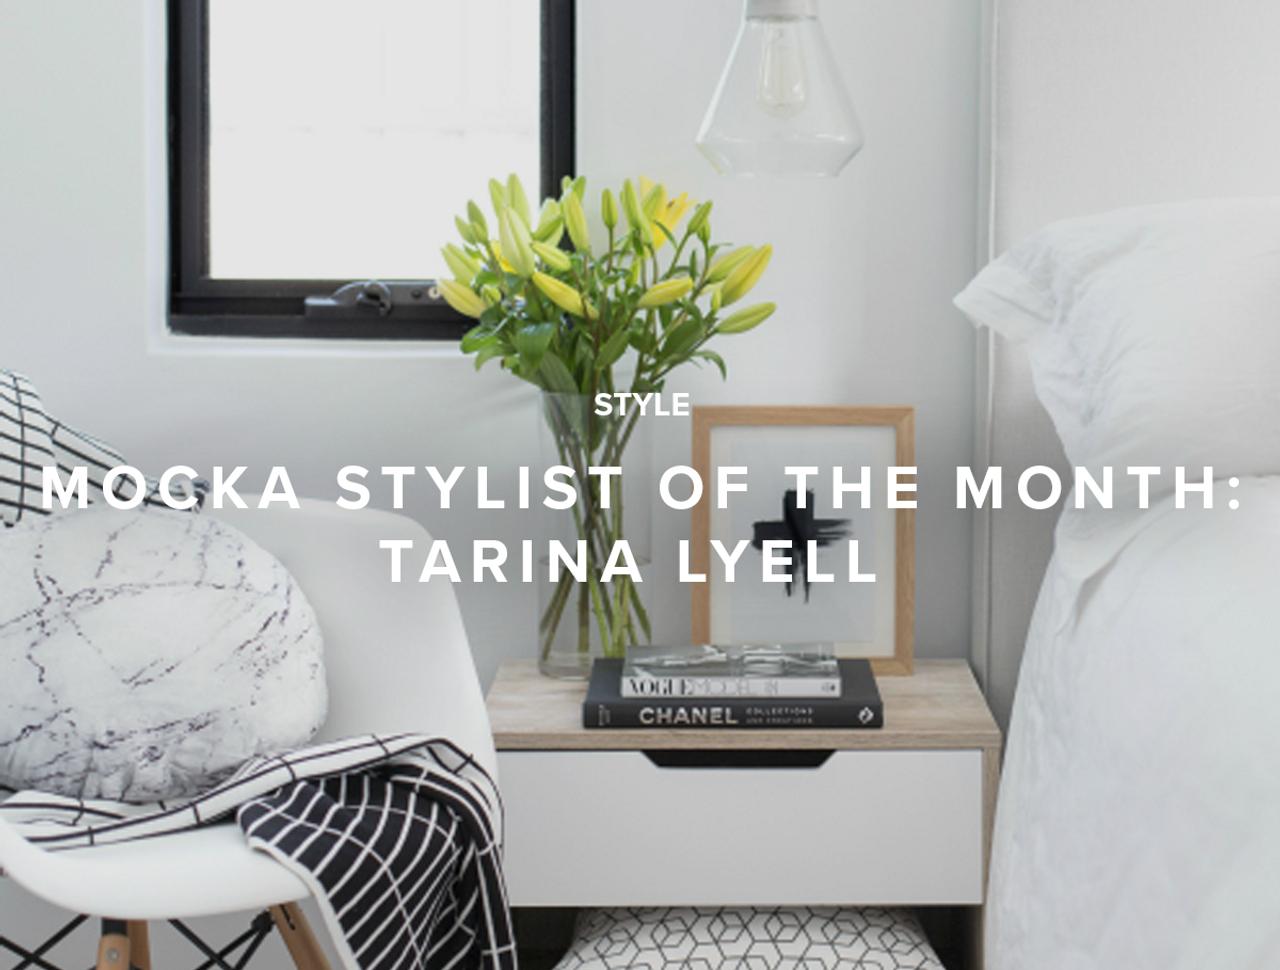 Mocka Stylist of the Month: Tarina Lyell